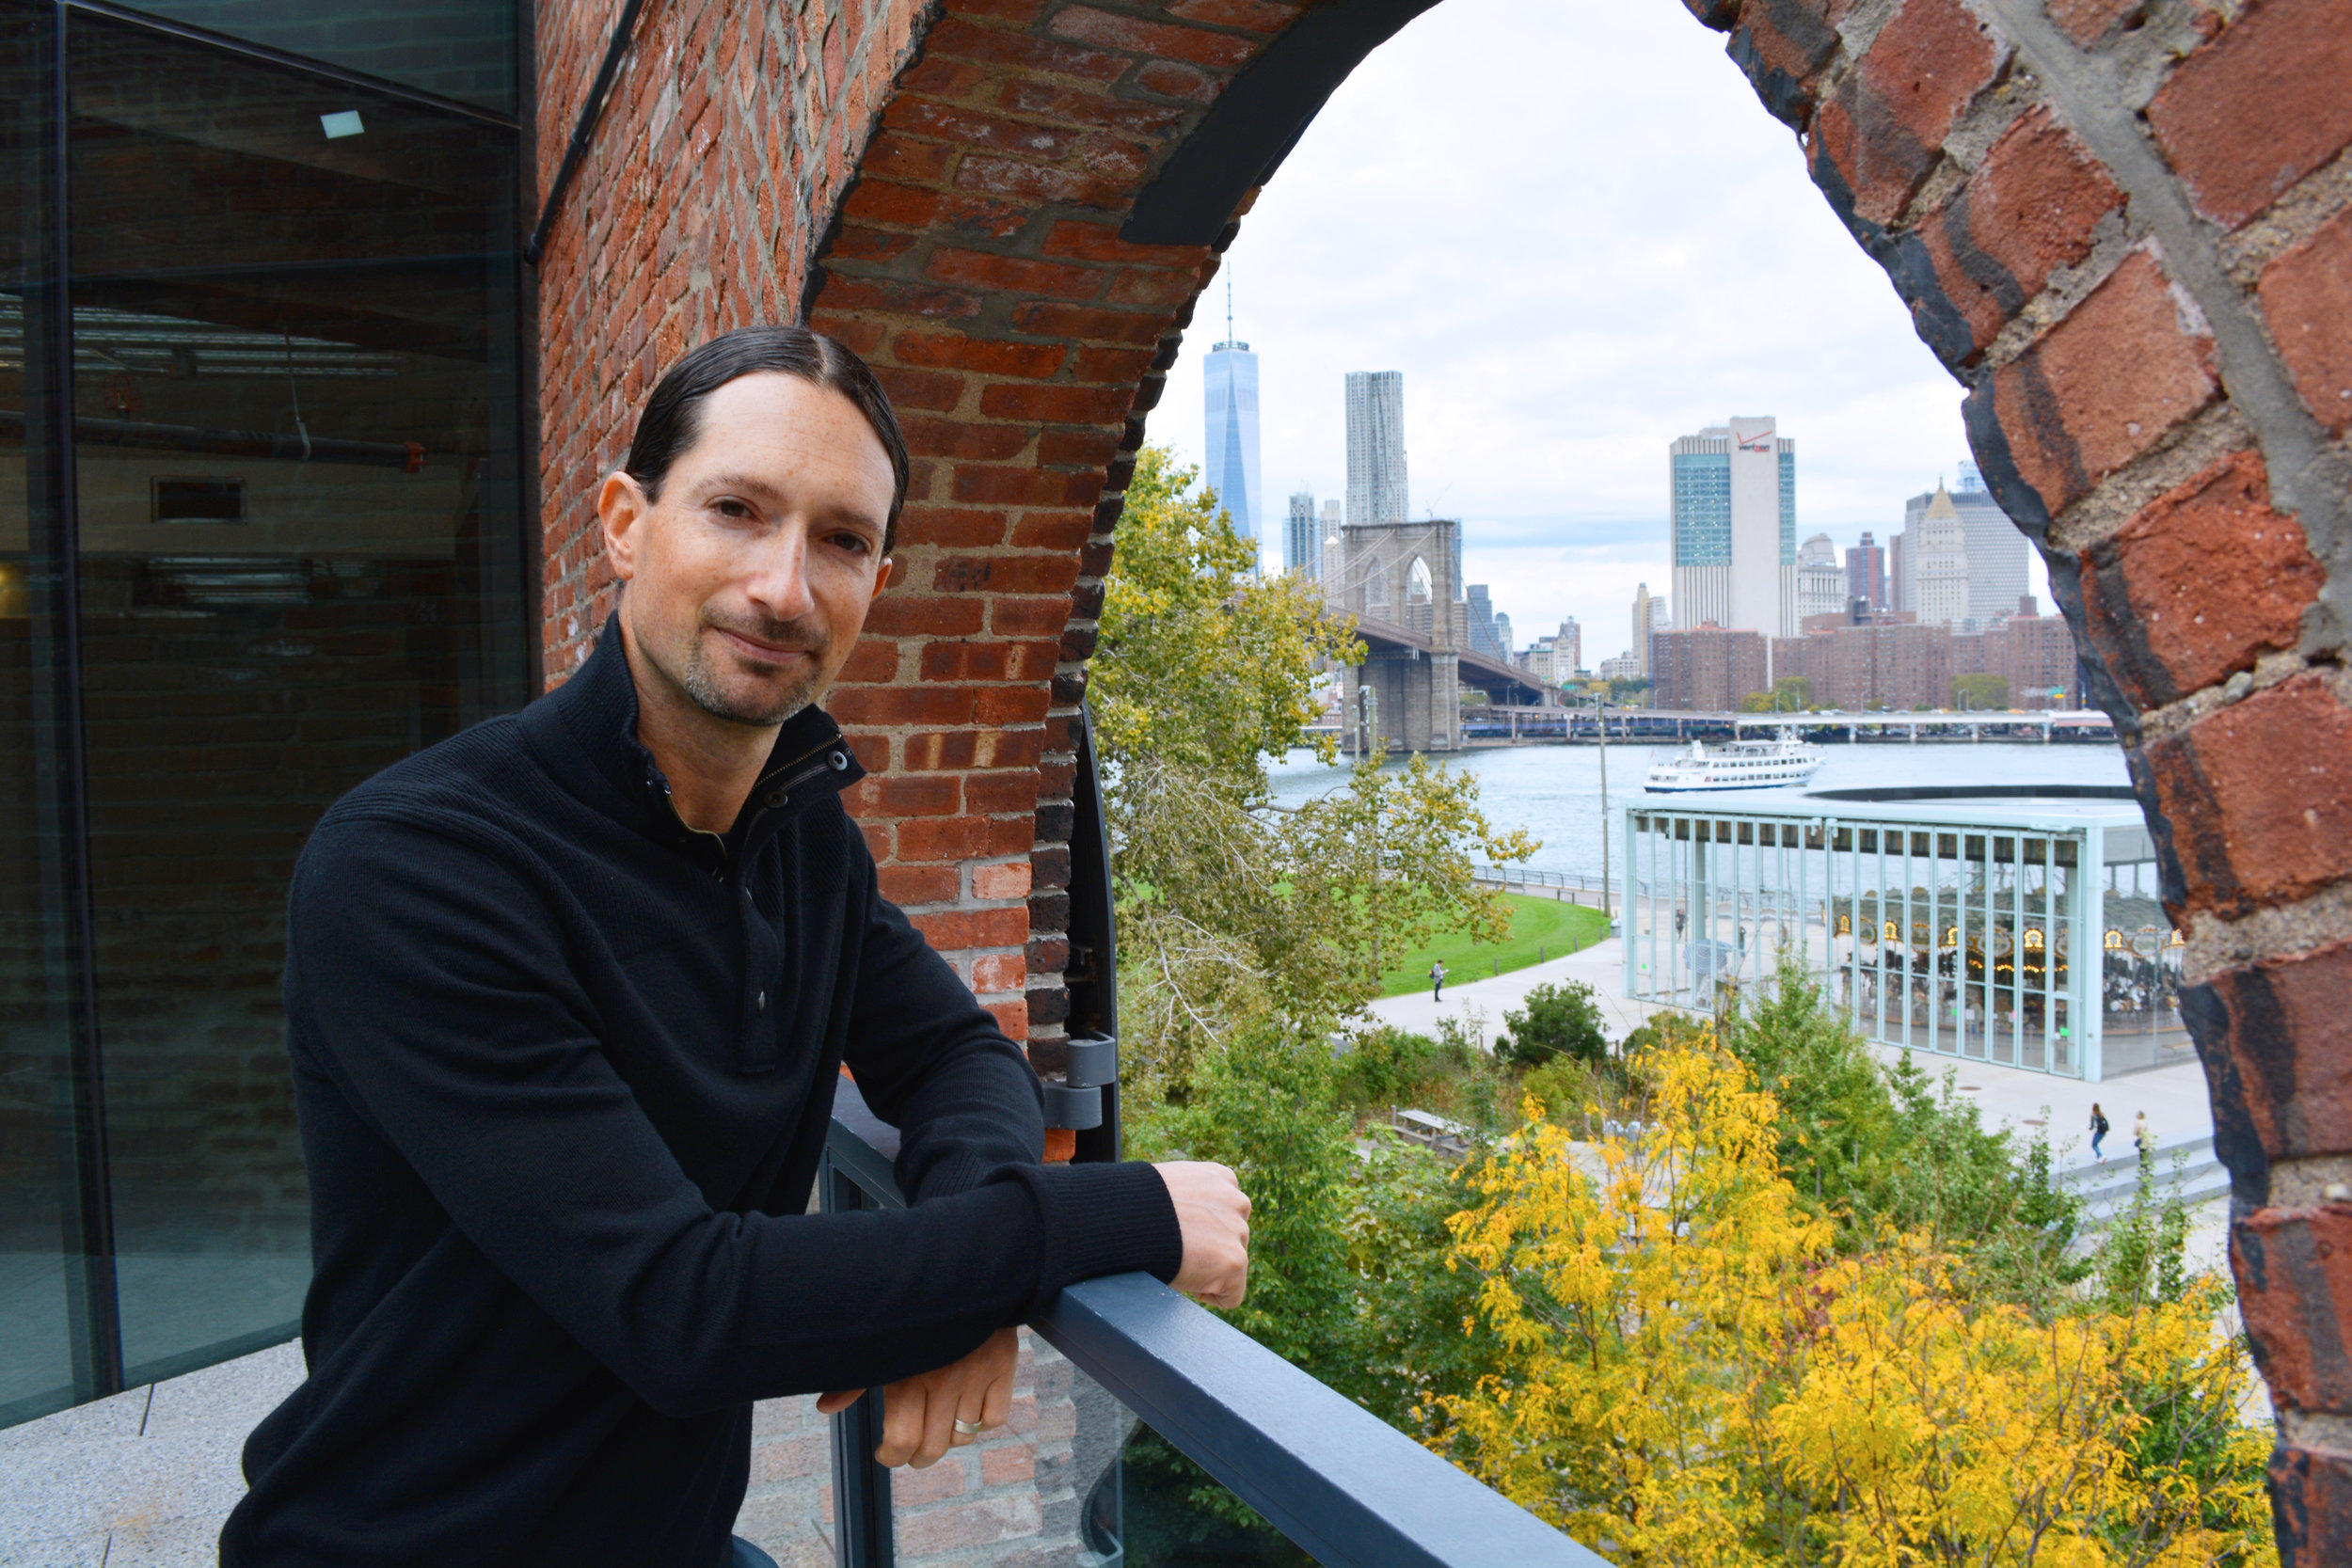 Ben Goldberg, composer. Ben's piece, Catalyst, received its world premiere at TEDxMidAtlantic 2017.